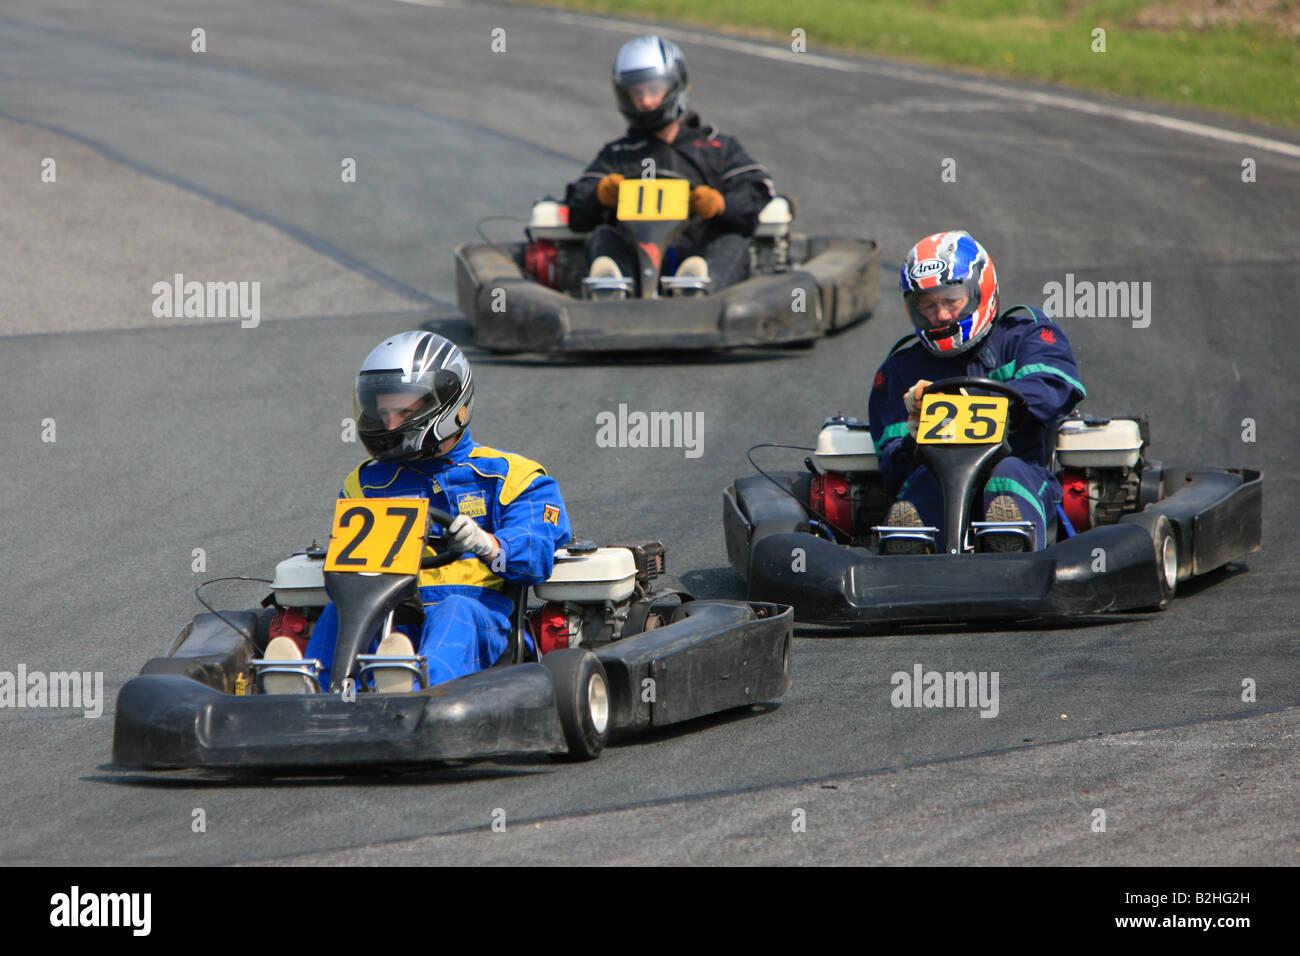 Karting at South Bank Motorsports Park Middlesbrough - Stock Image